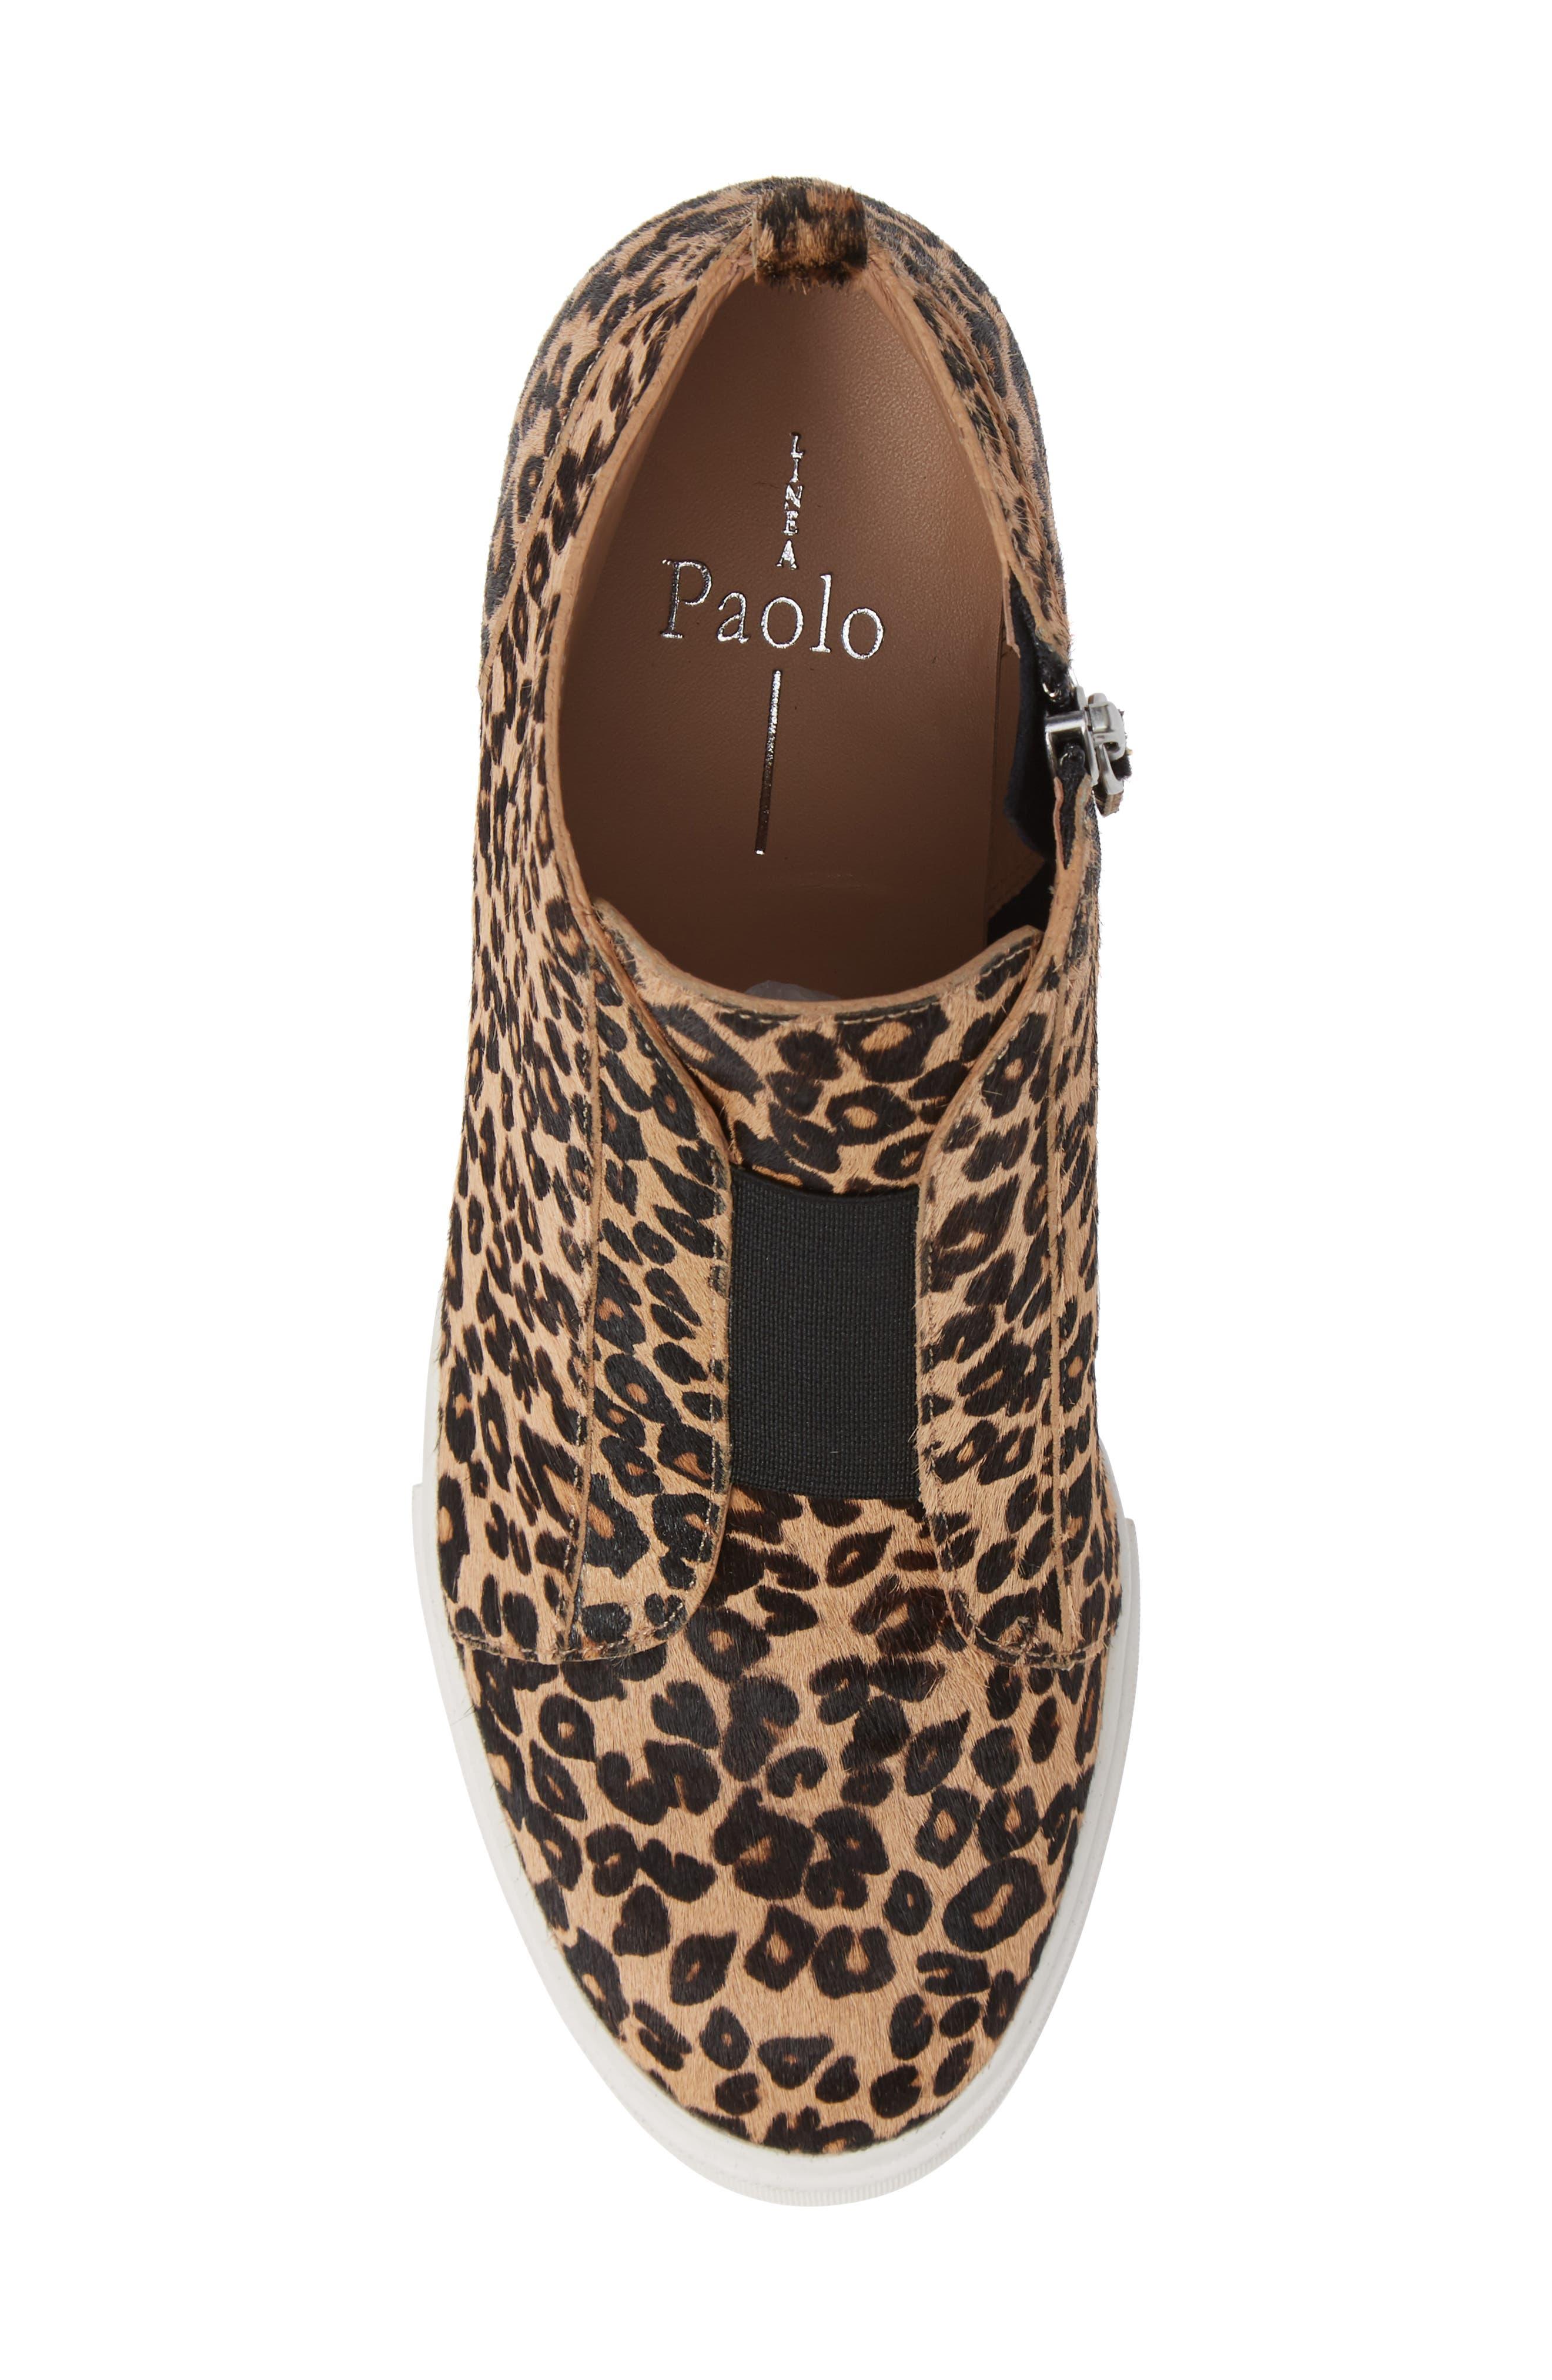 Felicia III Genuine Calf Hair Wedge Sneaker,                             Alternate thumbnail 5, color,                             LEOPARD PRINT HAIR CALF